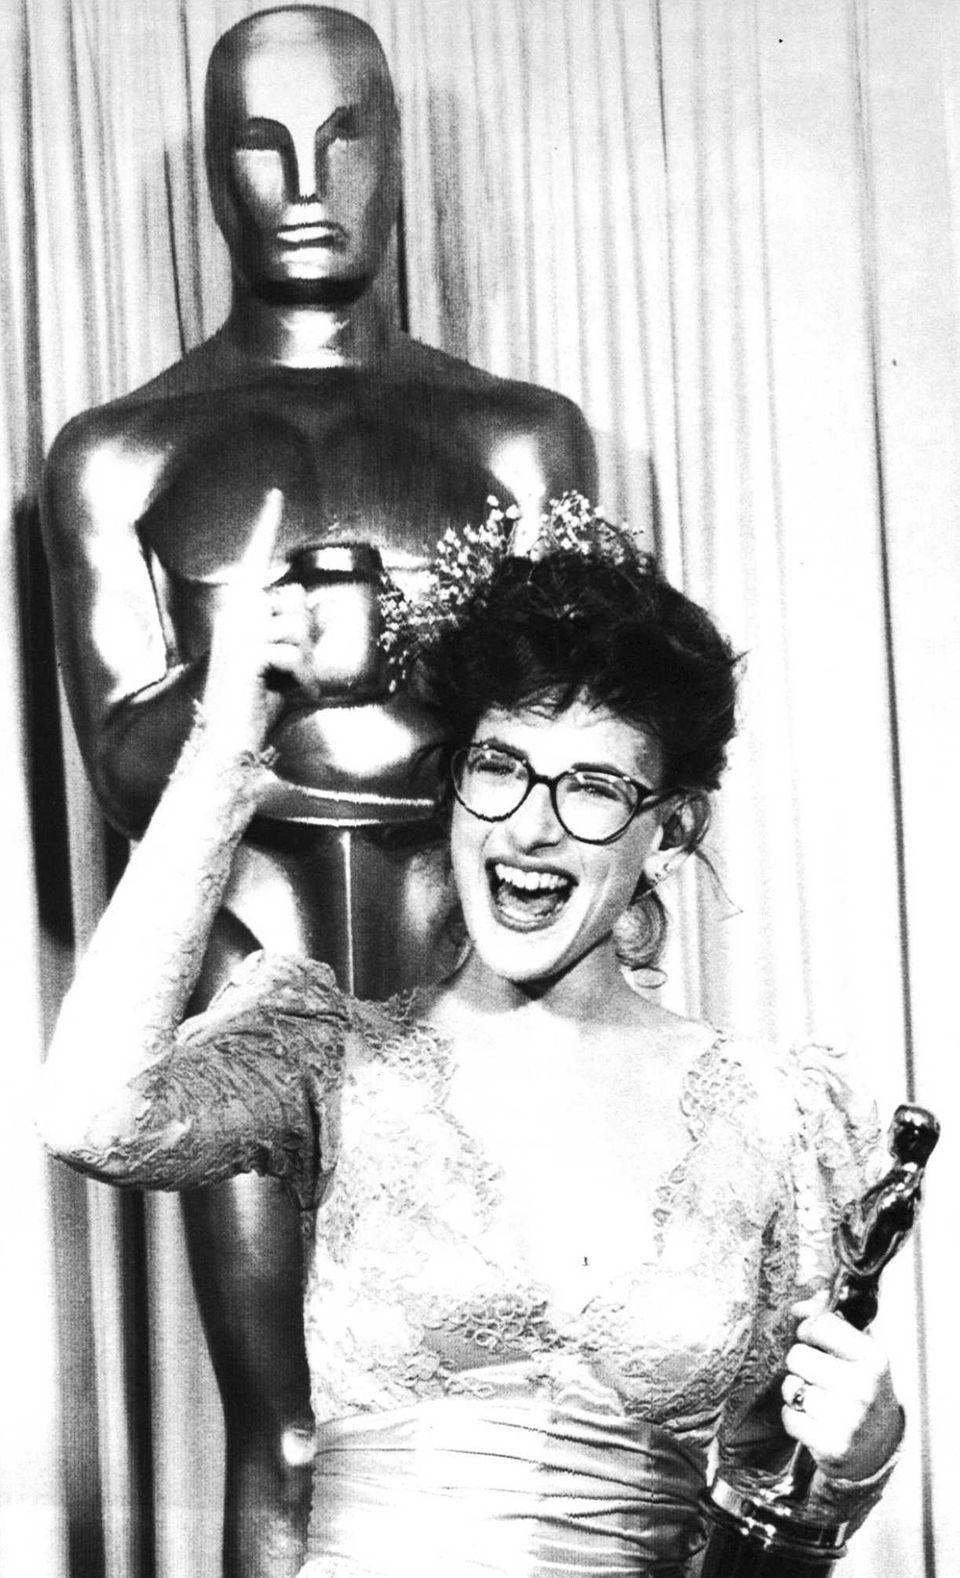 Actor Marlee Matlin, holding the Oscar statuette she